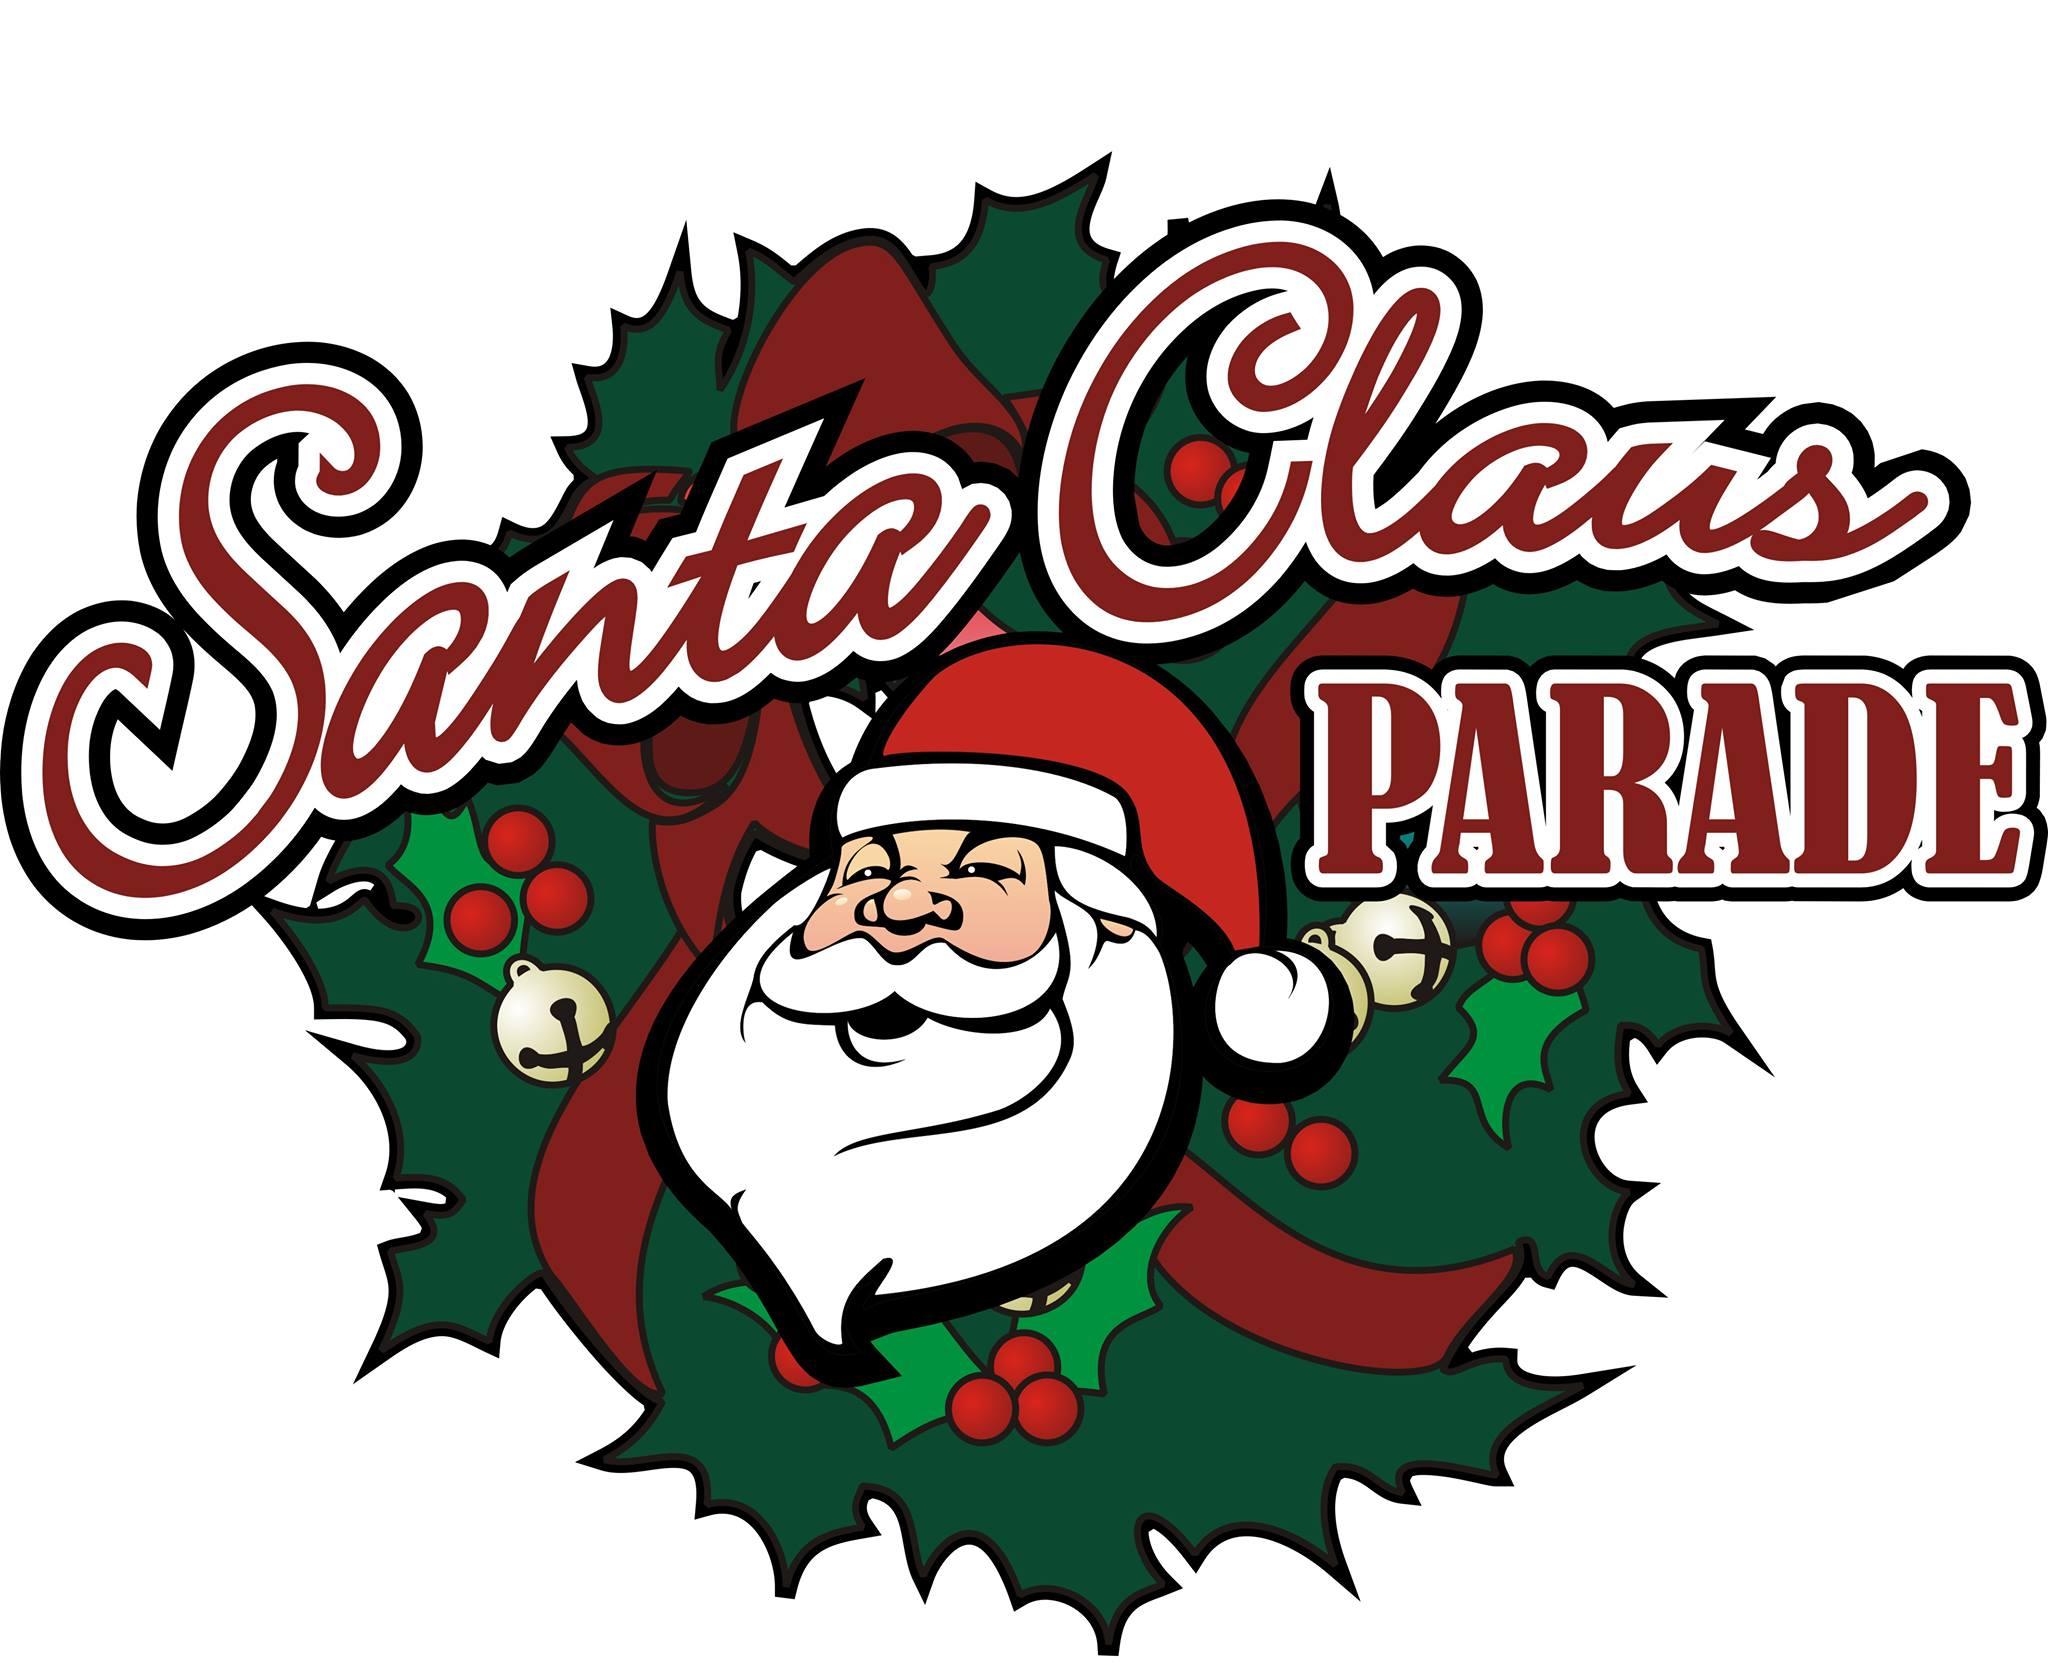 Santa Claus is coming to Cranbrook